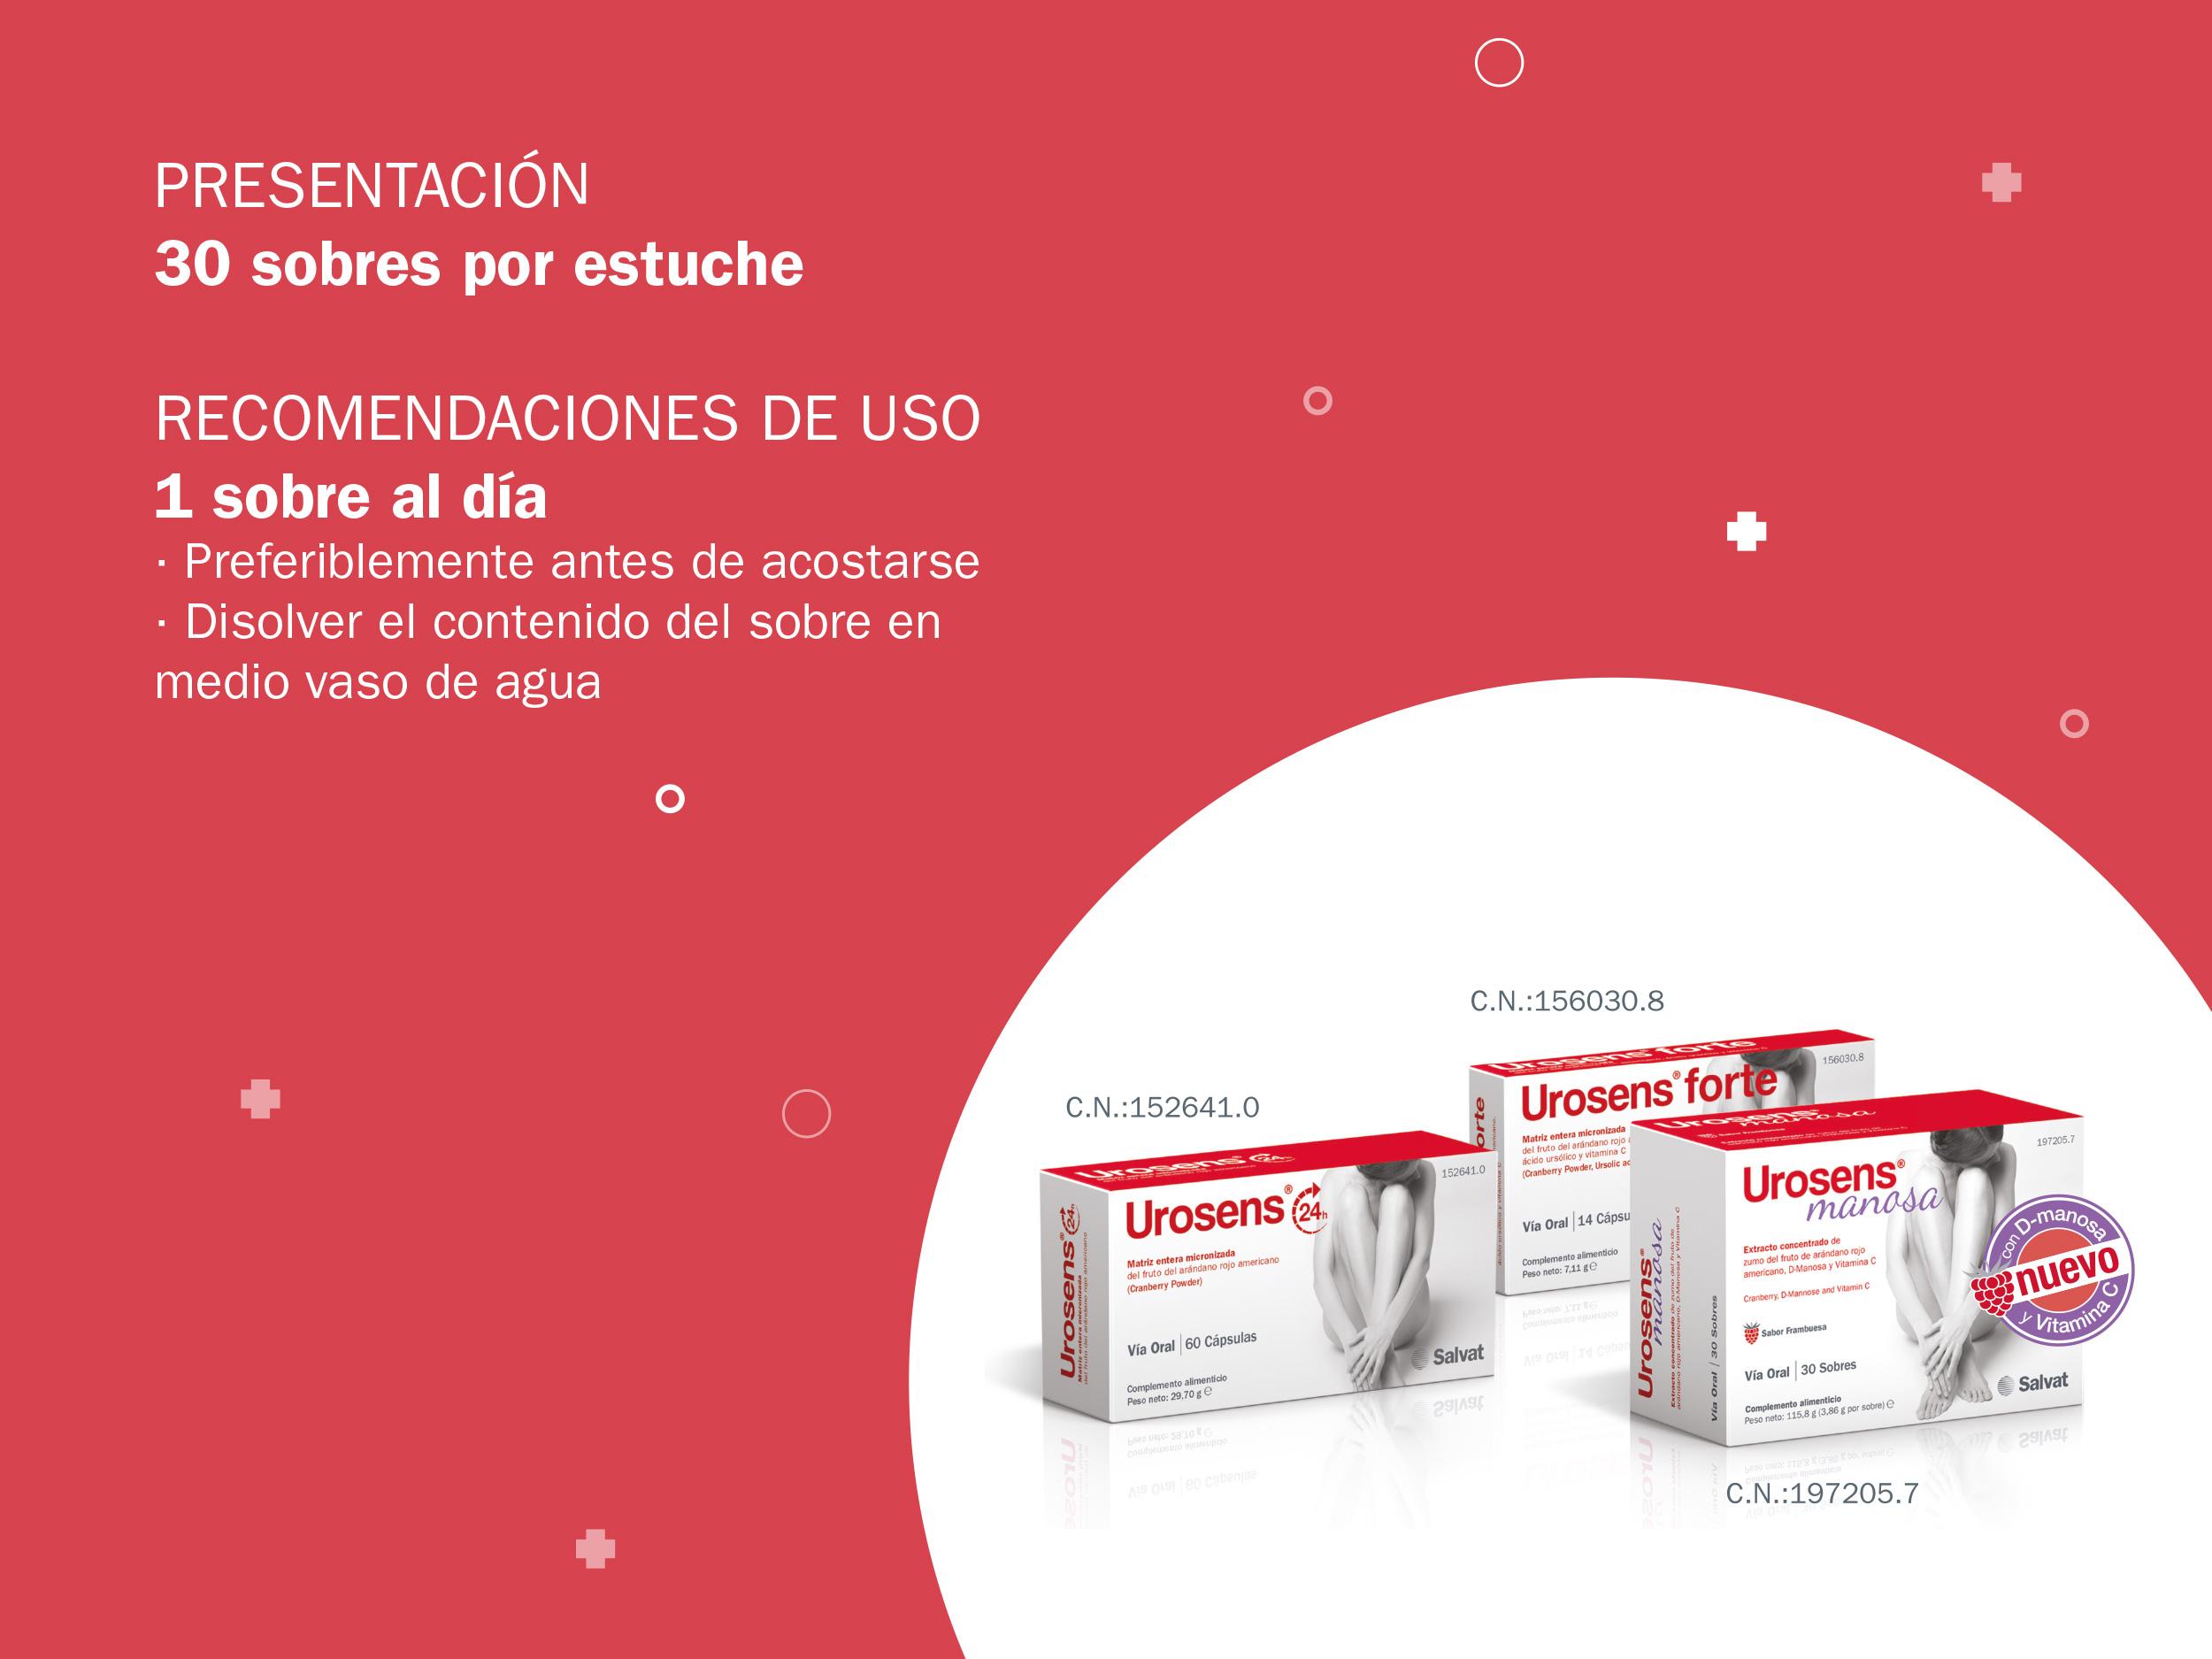 Contra Studio Graphic design Diseño gráfico Disseny gràfic Barcelona Terrassa Laboratorios Salvat Urosens Manosa mailing publicidad farmacia pharma